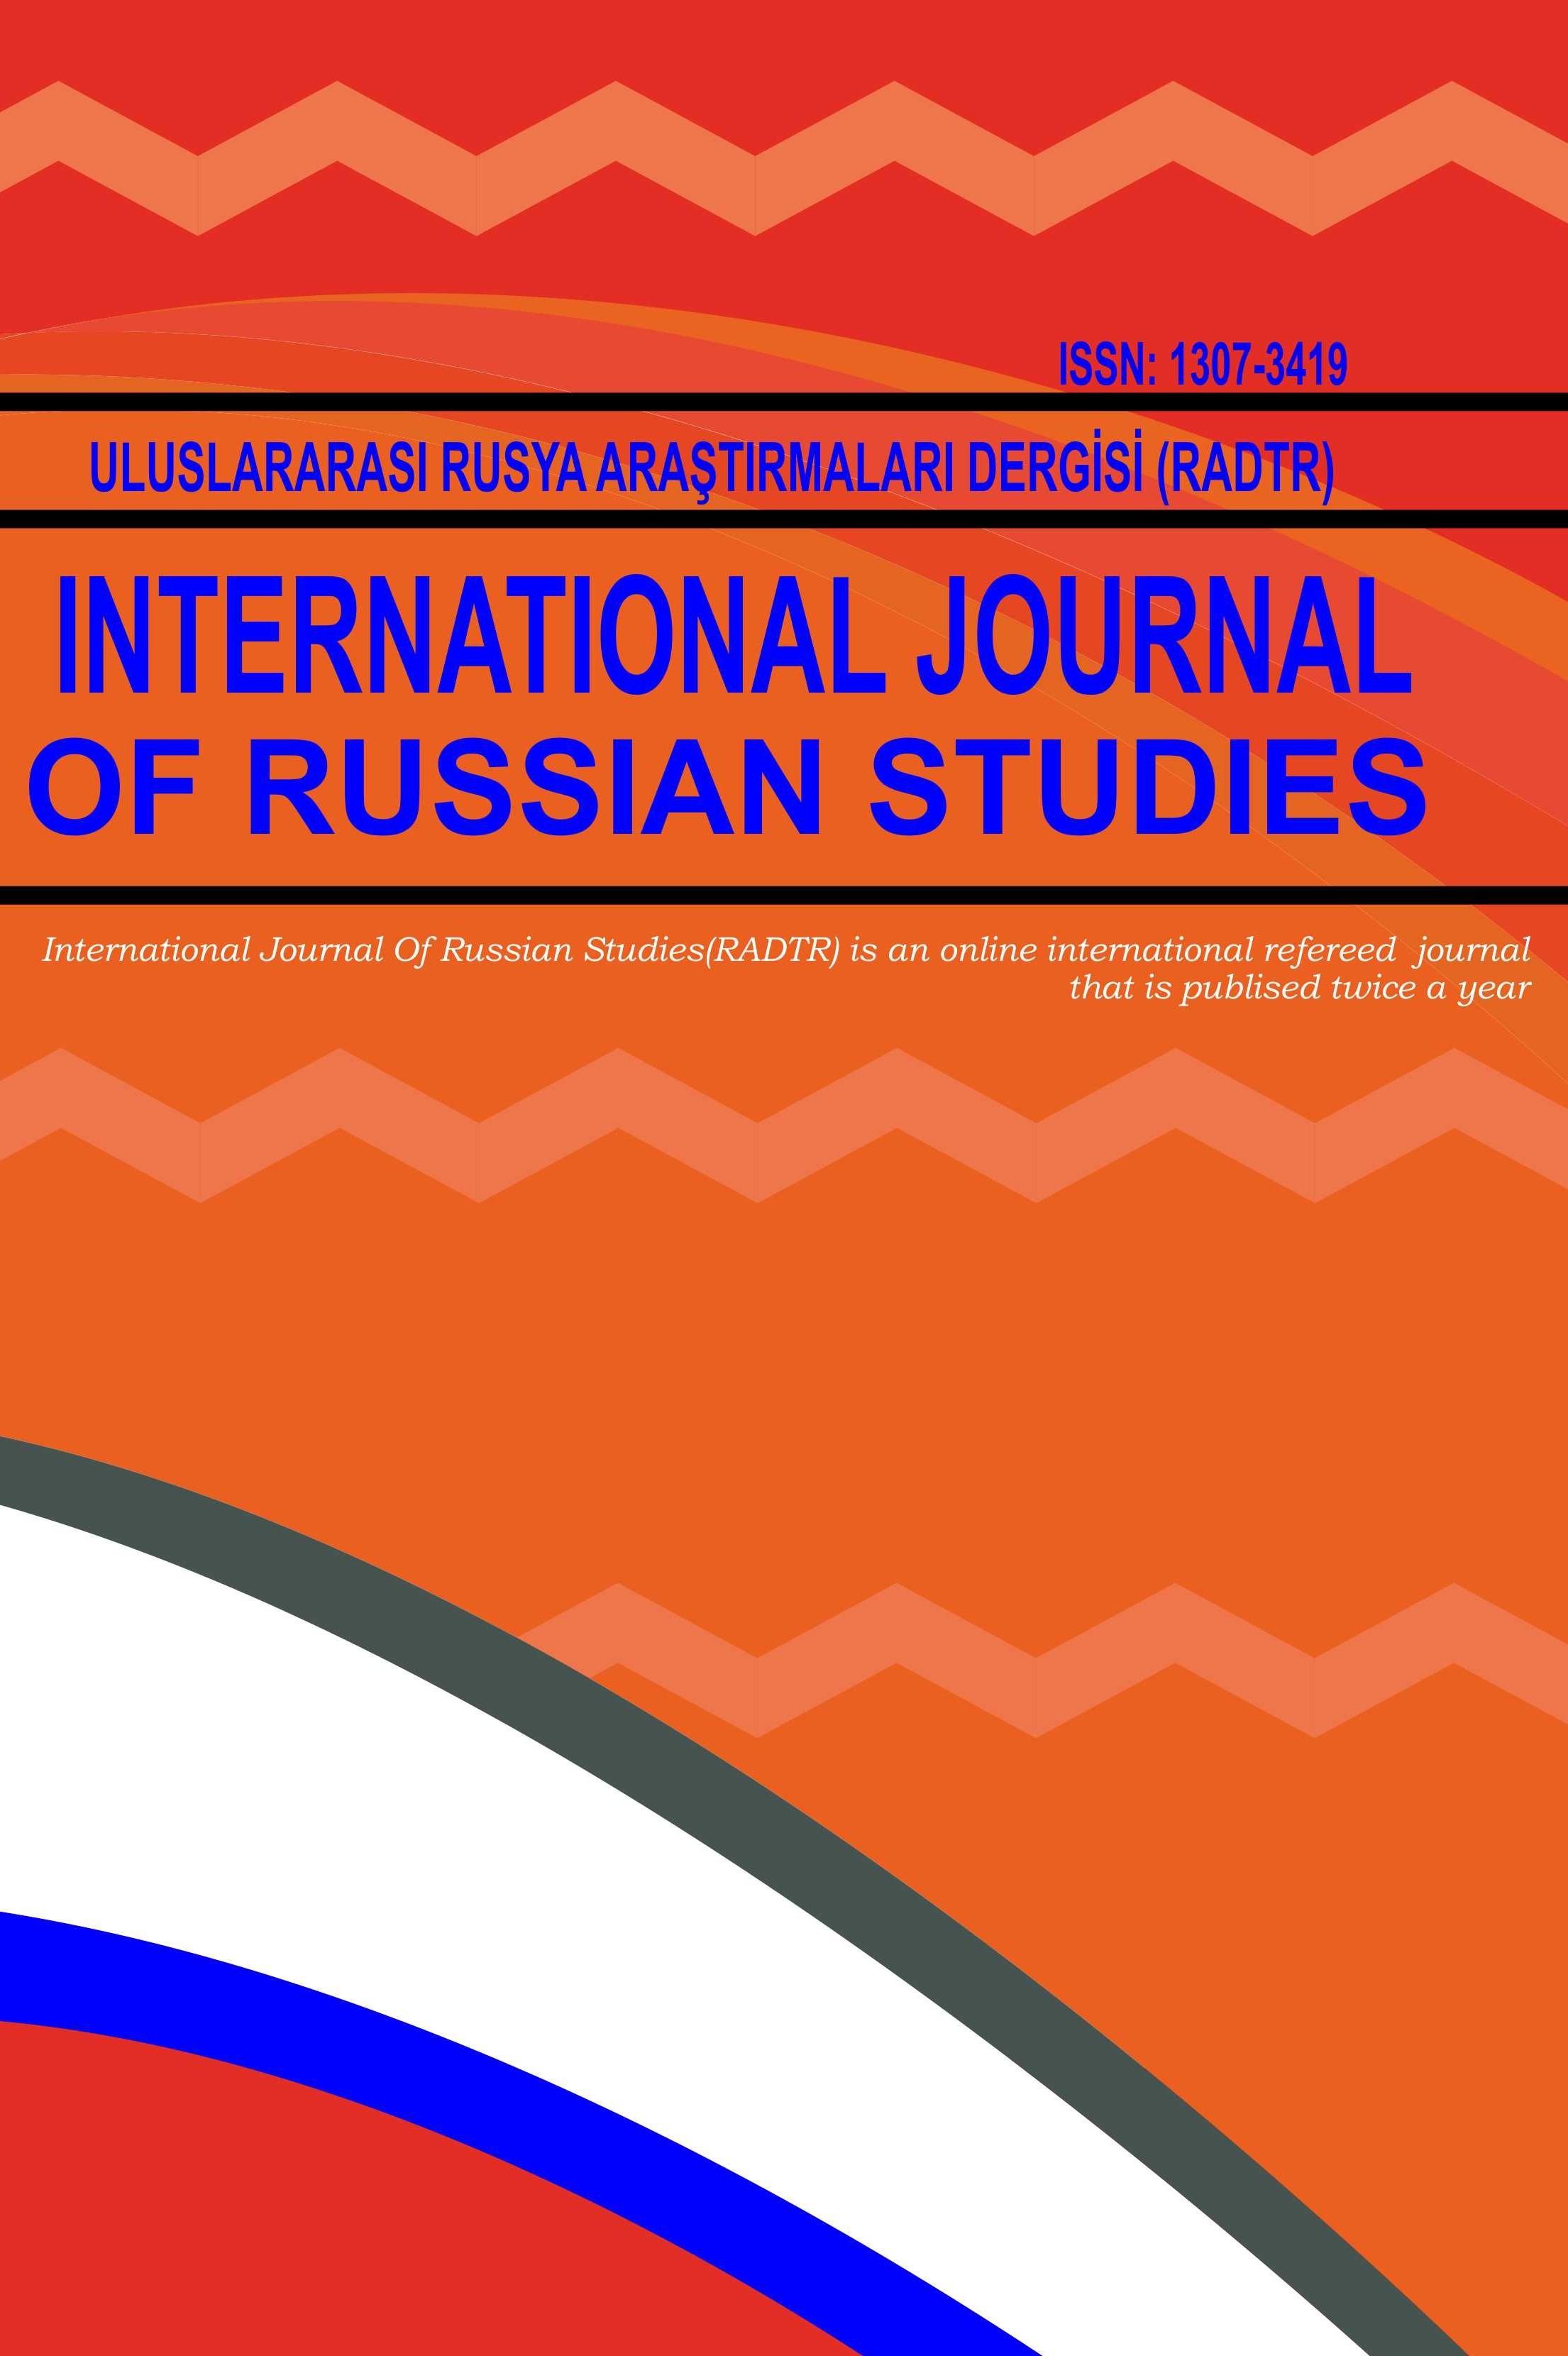 International Journal of Russian Studies